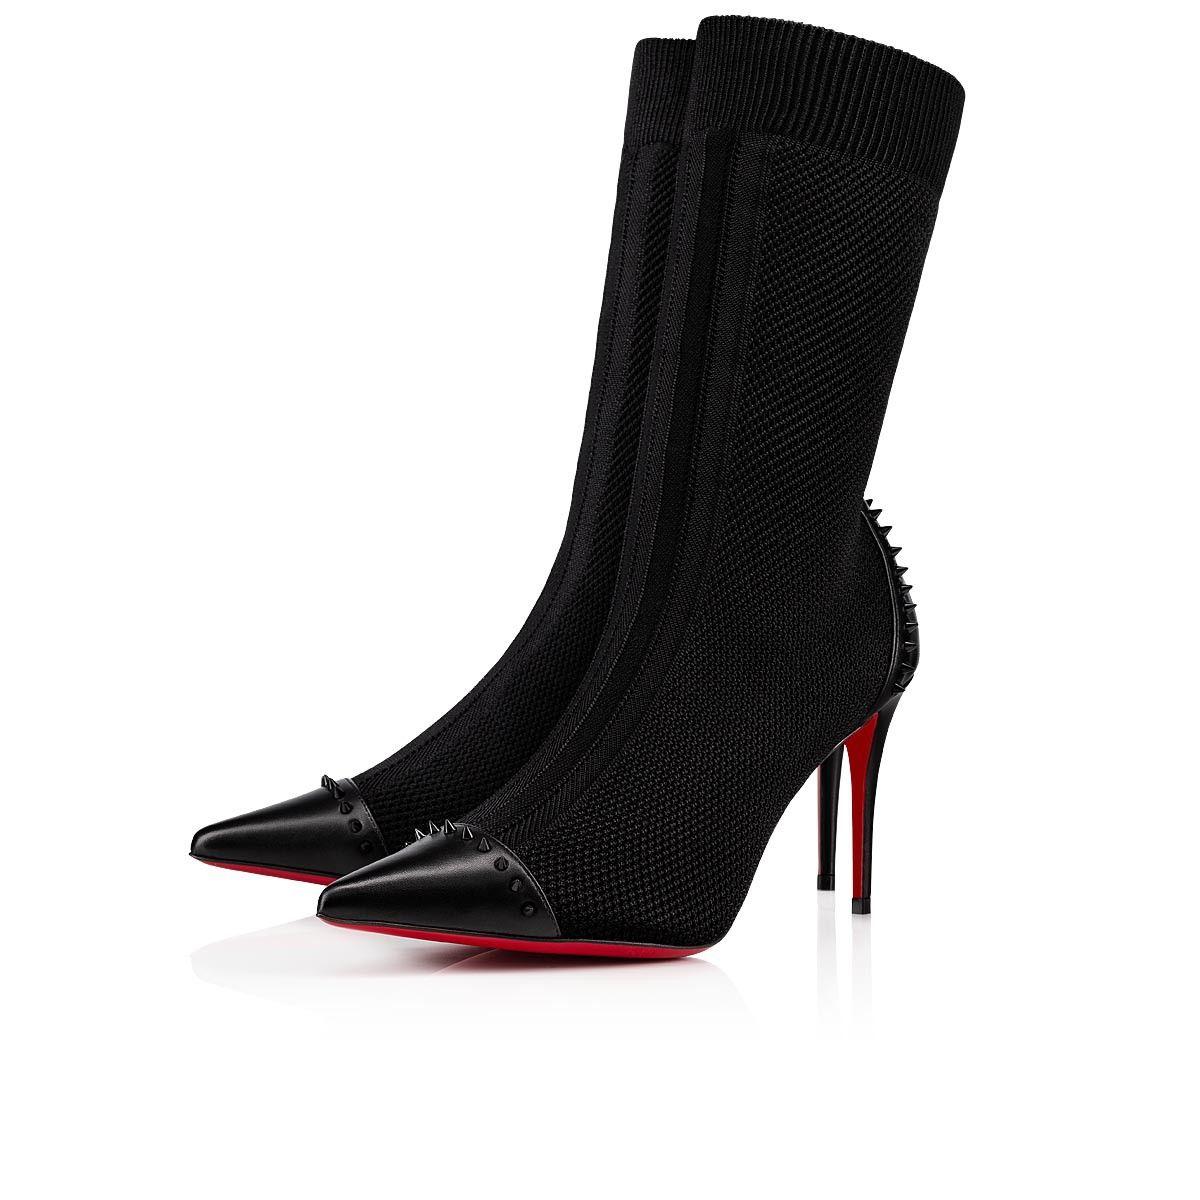 c16c1662dd22 Dovi Dova 85 Black Cotton - Women Shoes - Christian Louboutin in ...